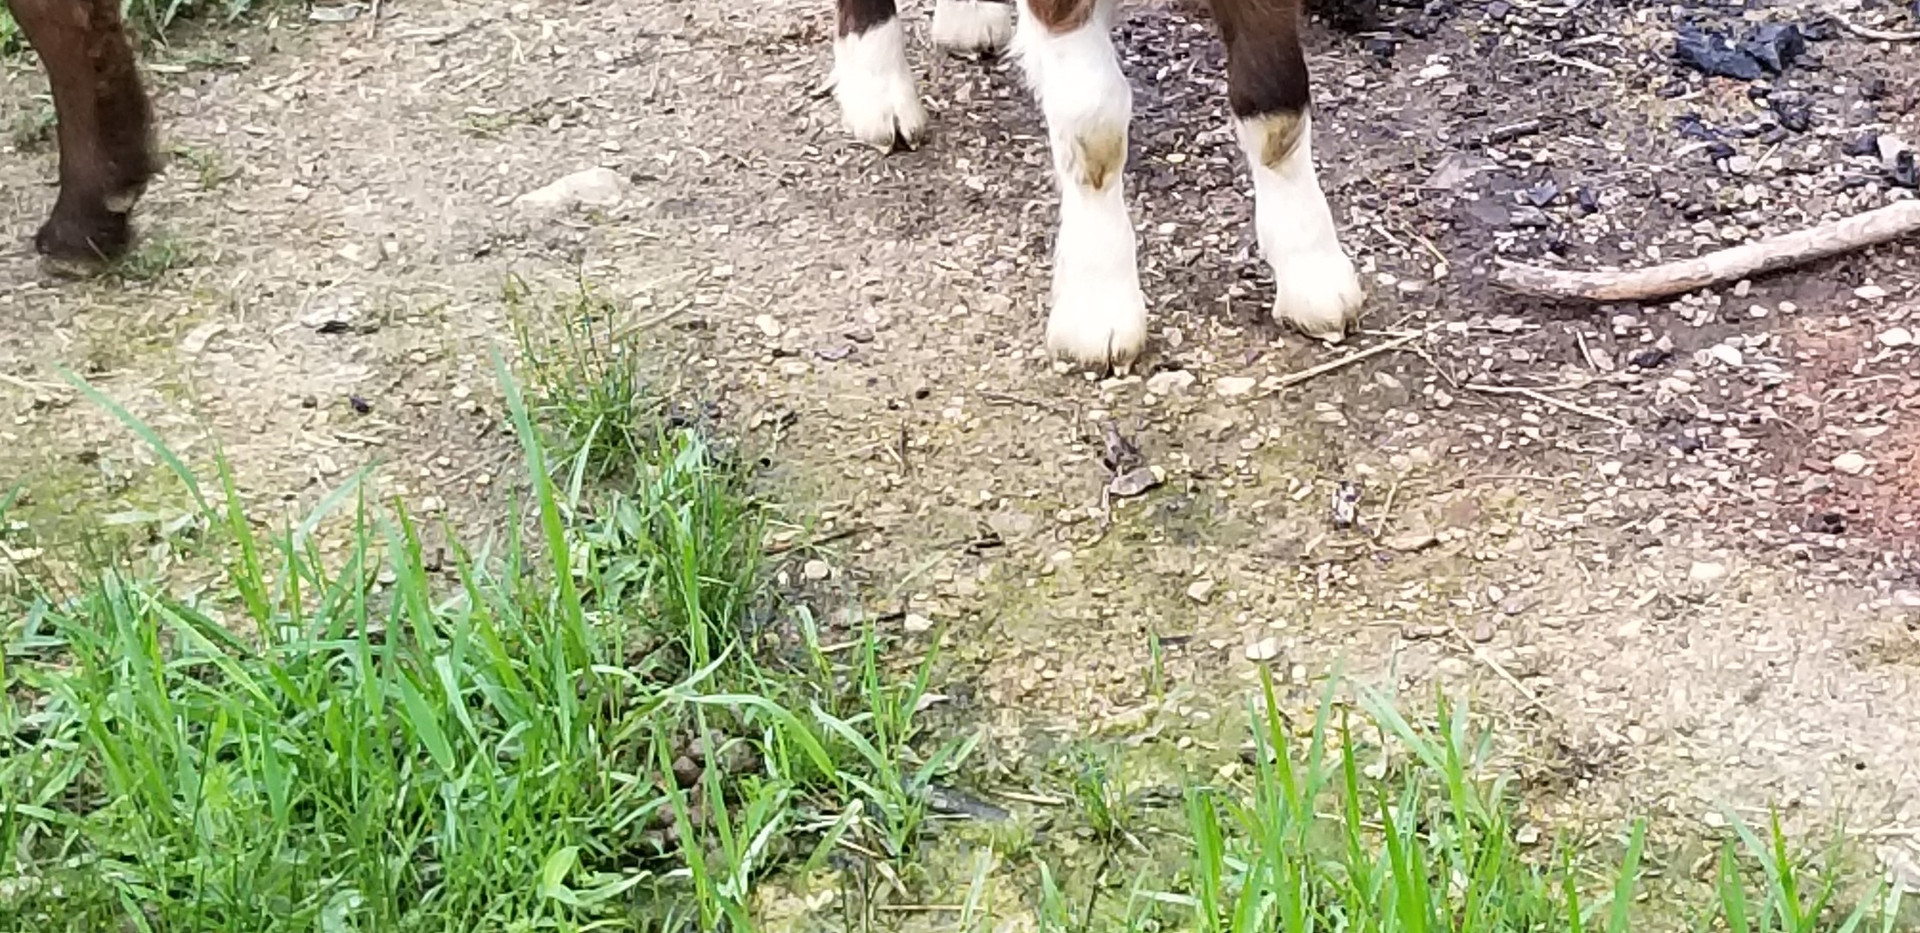 Baby goat for sale Midland NC.jpg